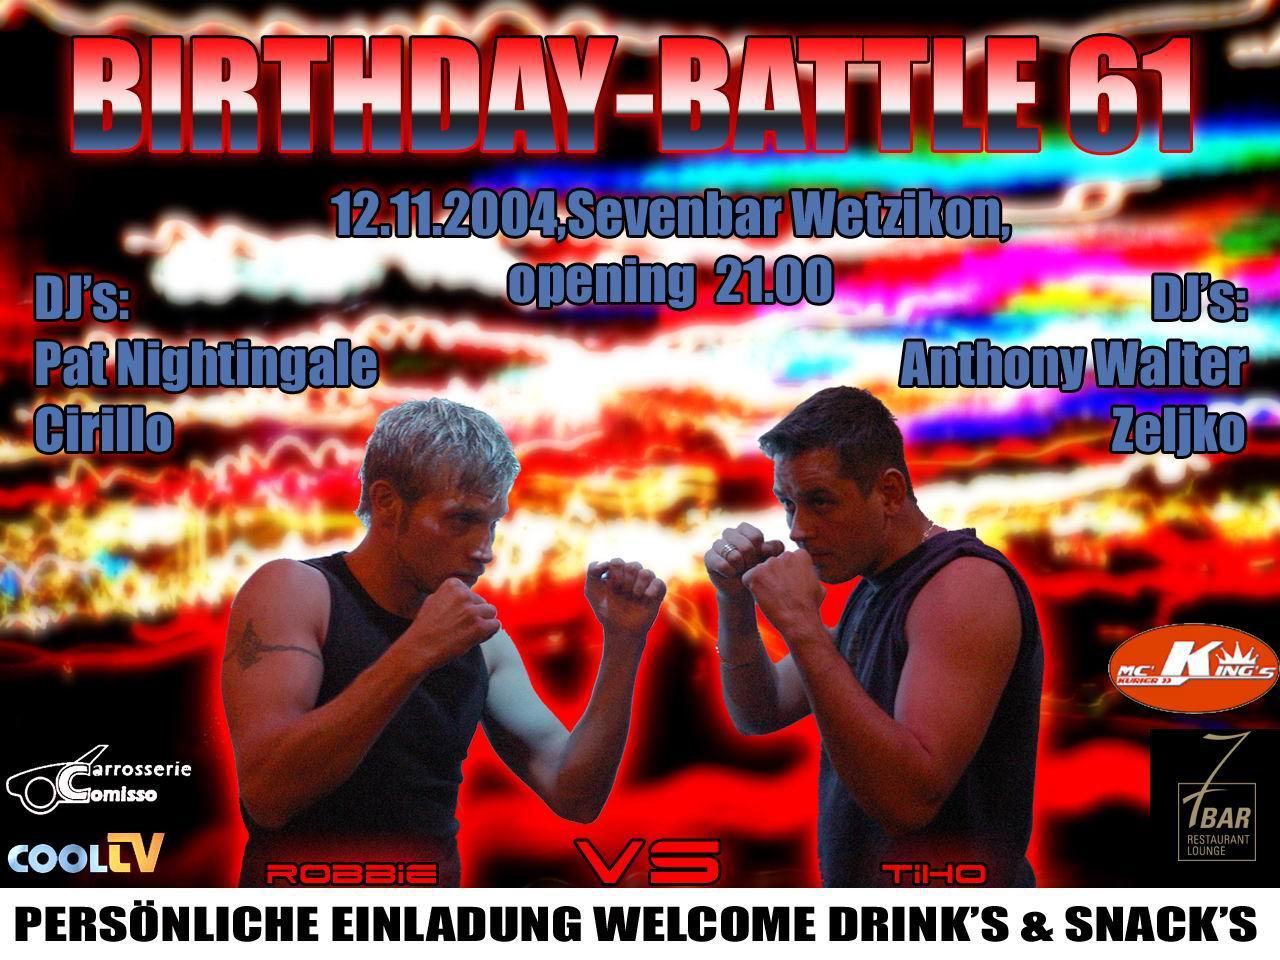 Birthday Battle | Sevenbar Wetzikon (ZH)